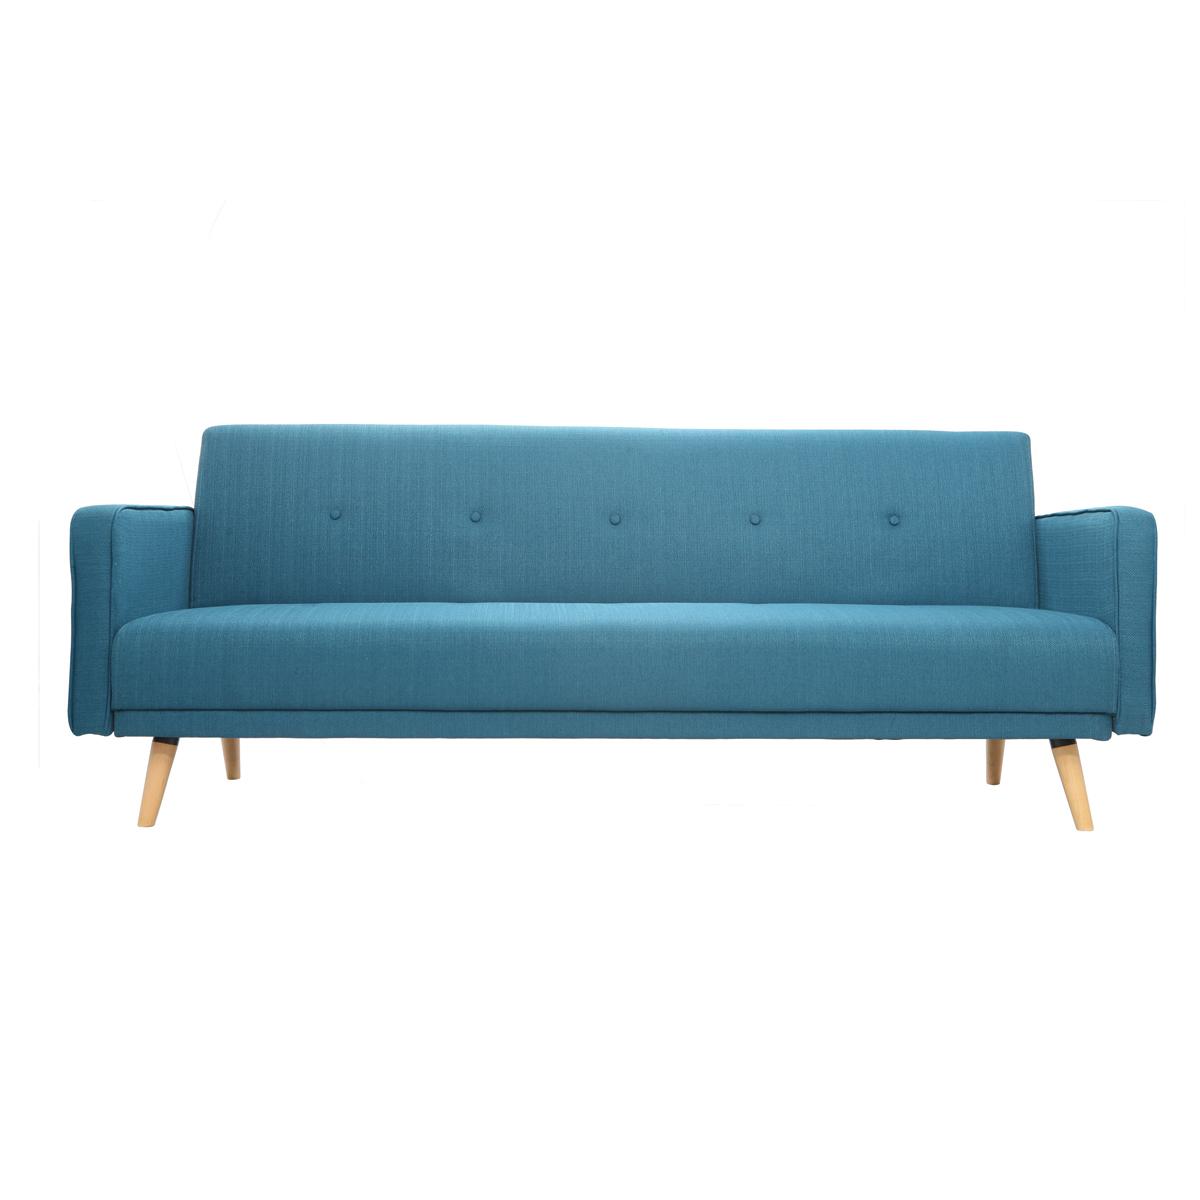 Divano convertibile 3 posti design scandinavo blu ULLA